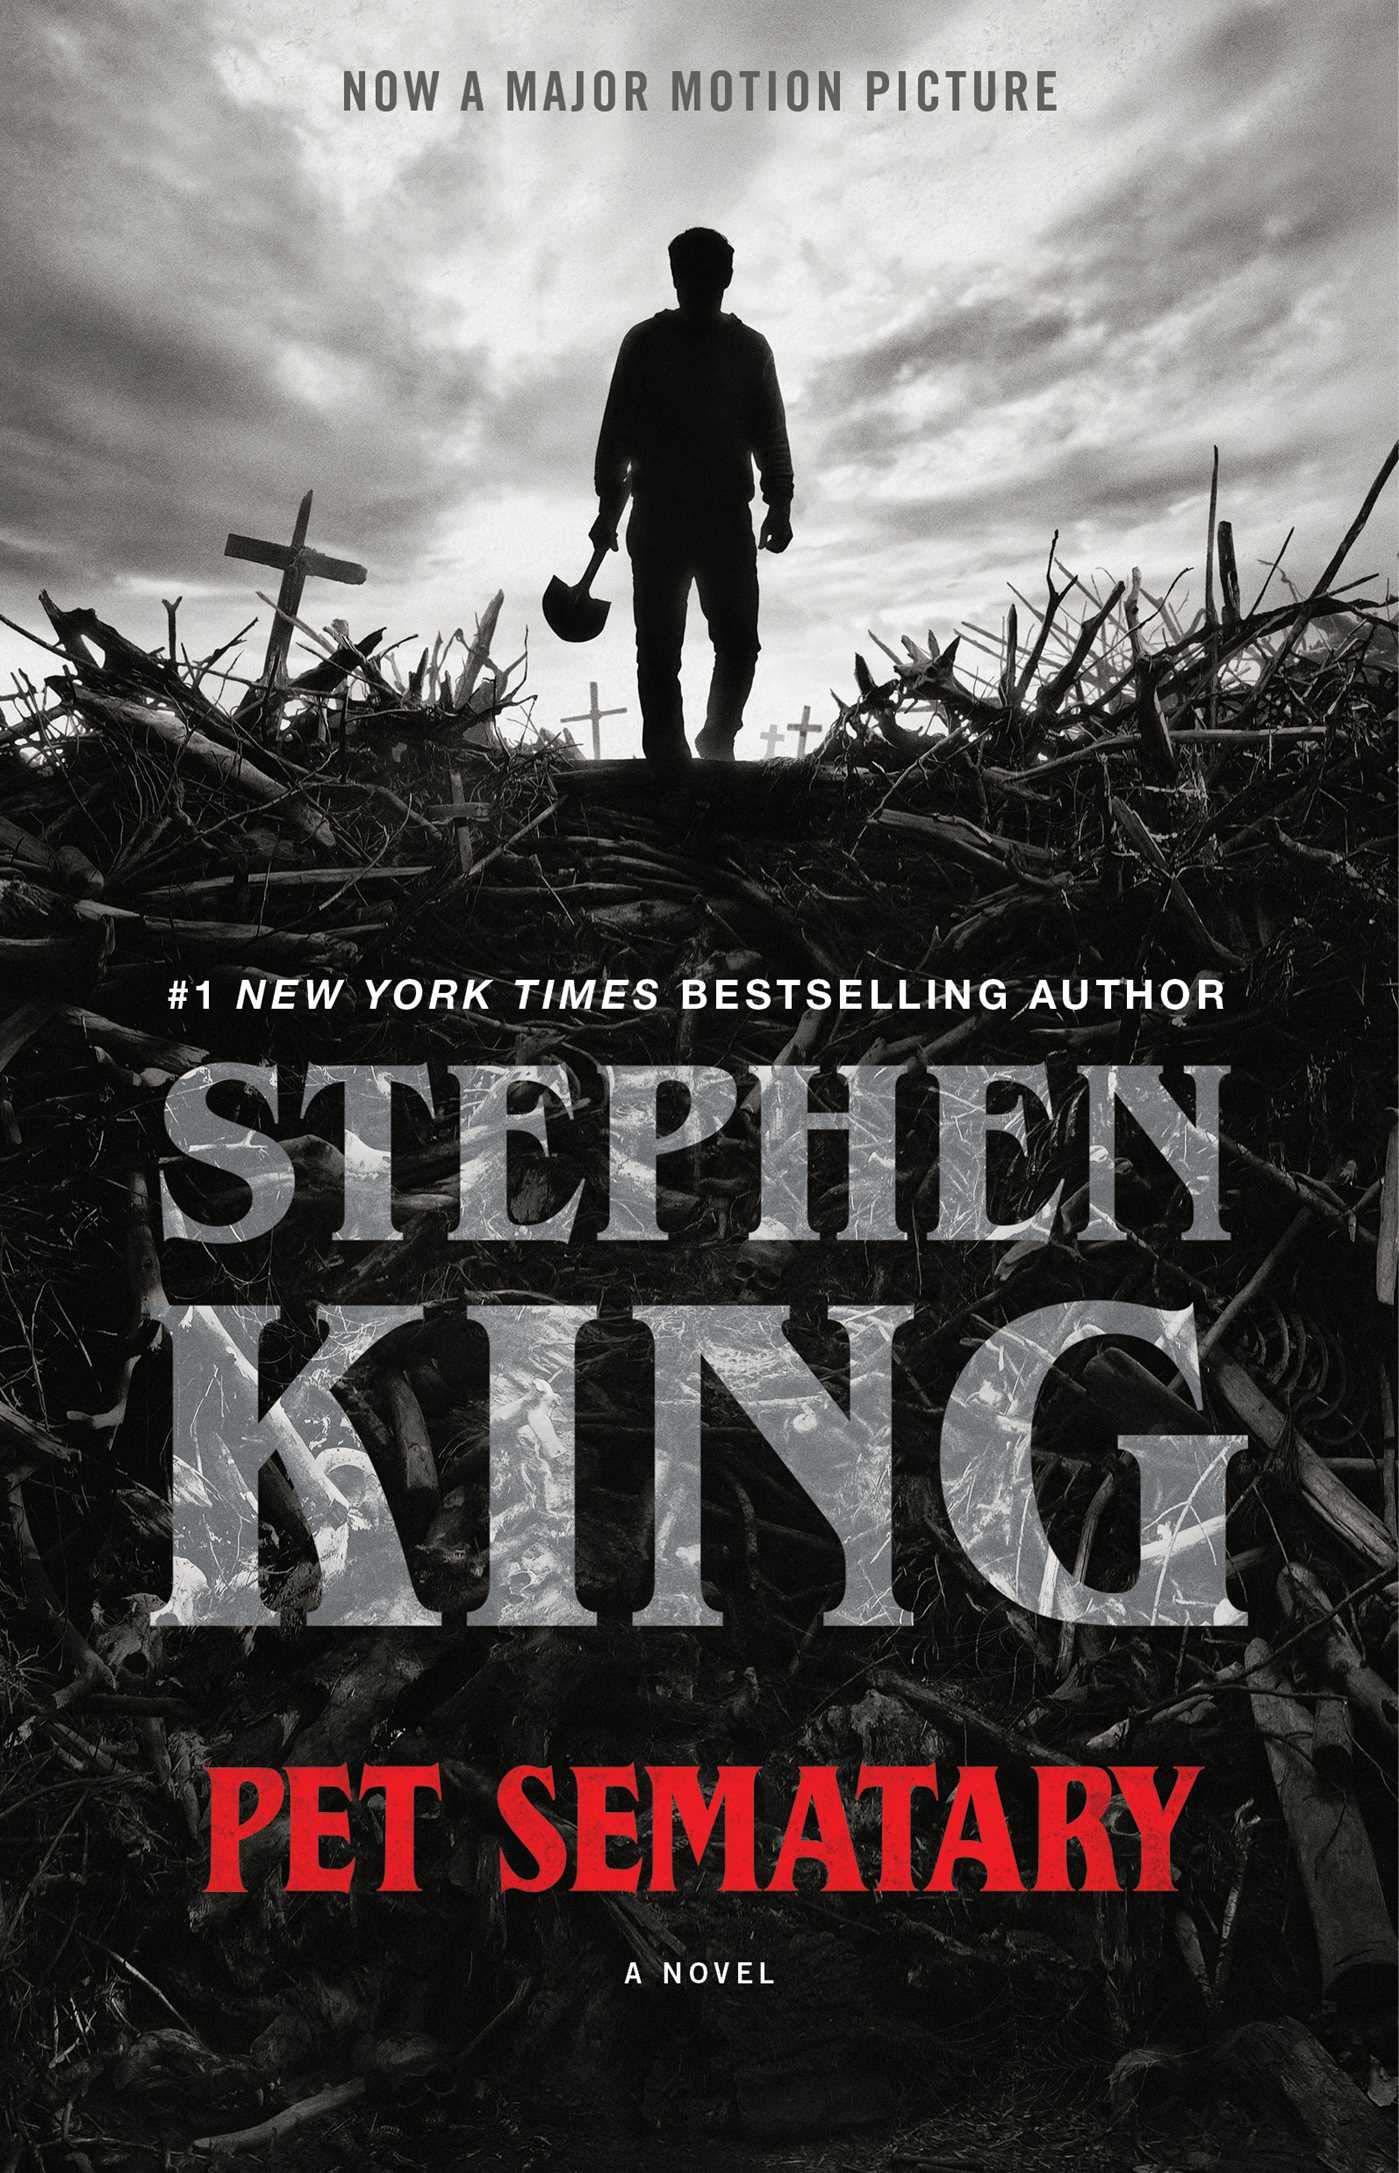 Pet Sematary: Amazon.co.uk: King, Stephen: 9781982115982: Books